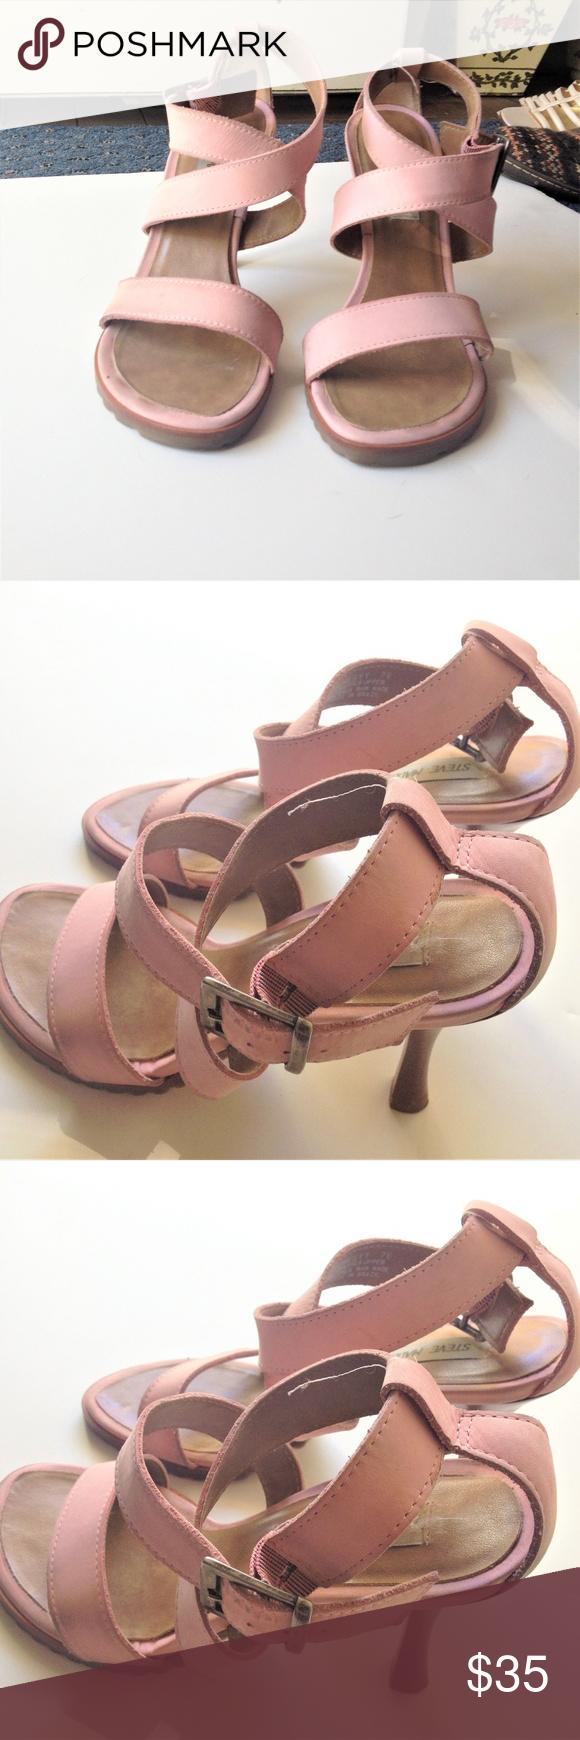 cfc0574ce5d Steve Madden Pink Strap Heel Sandal Shoes Sz 7 Lovely with X ankle strap  design.